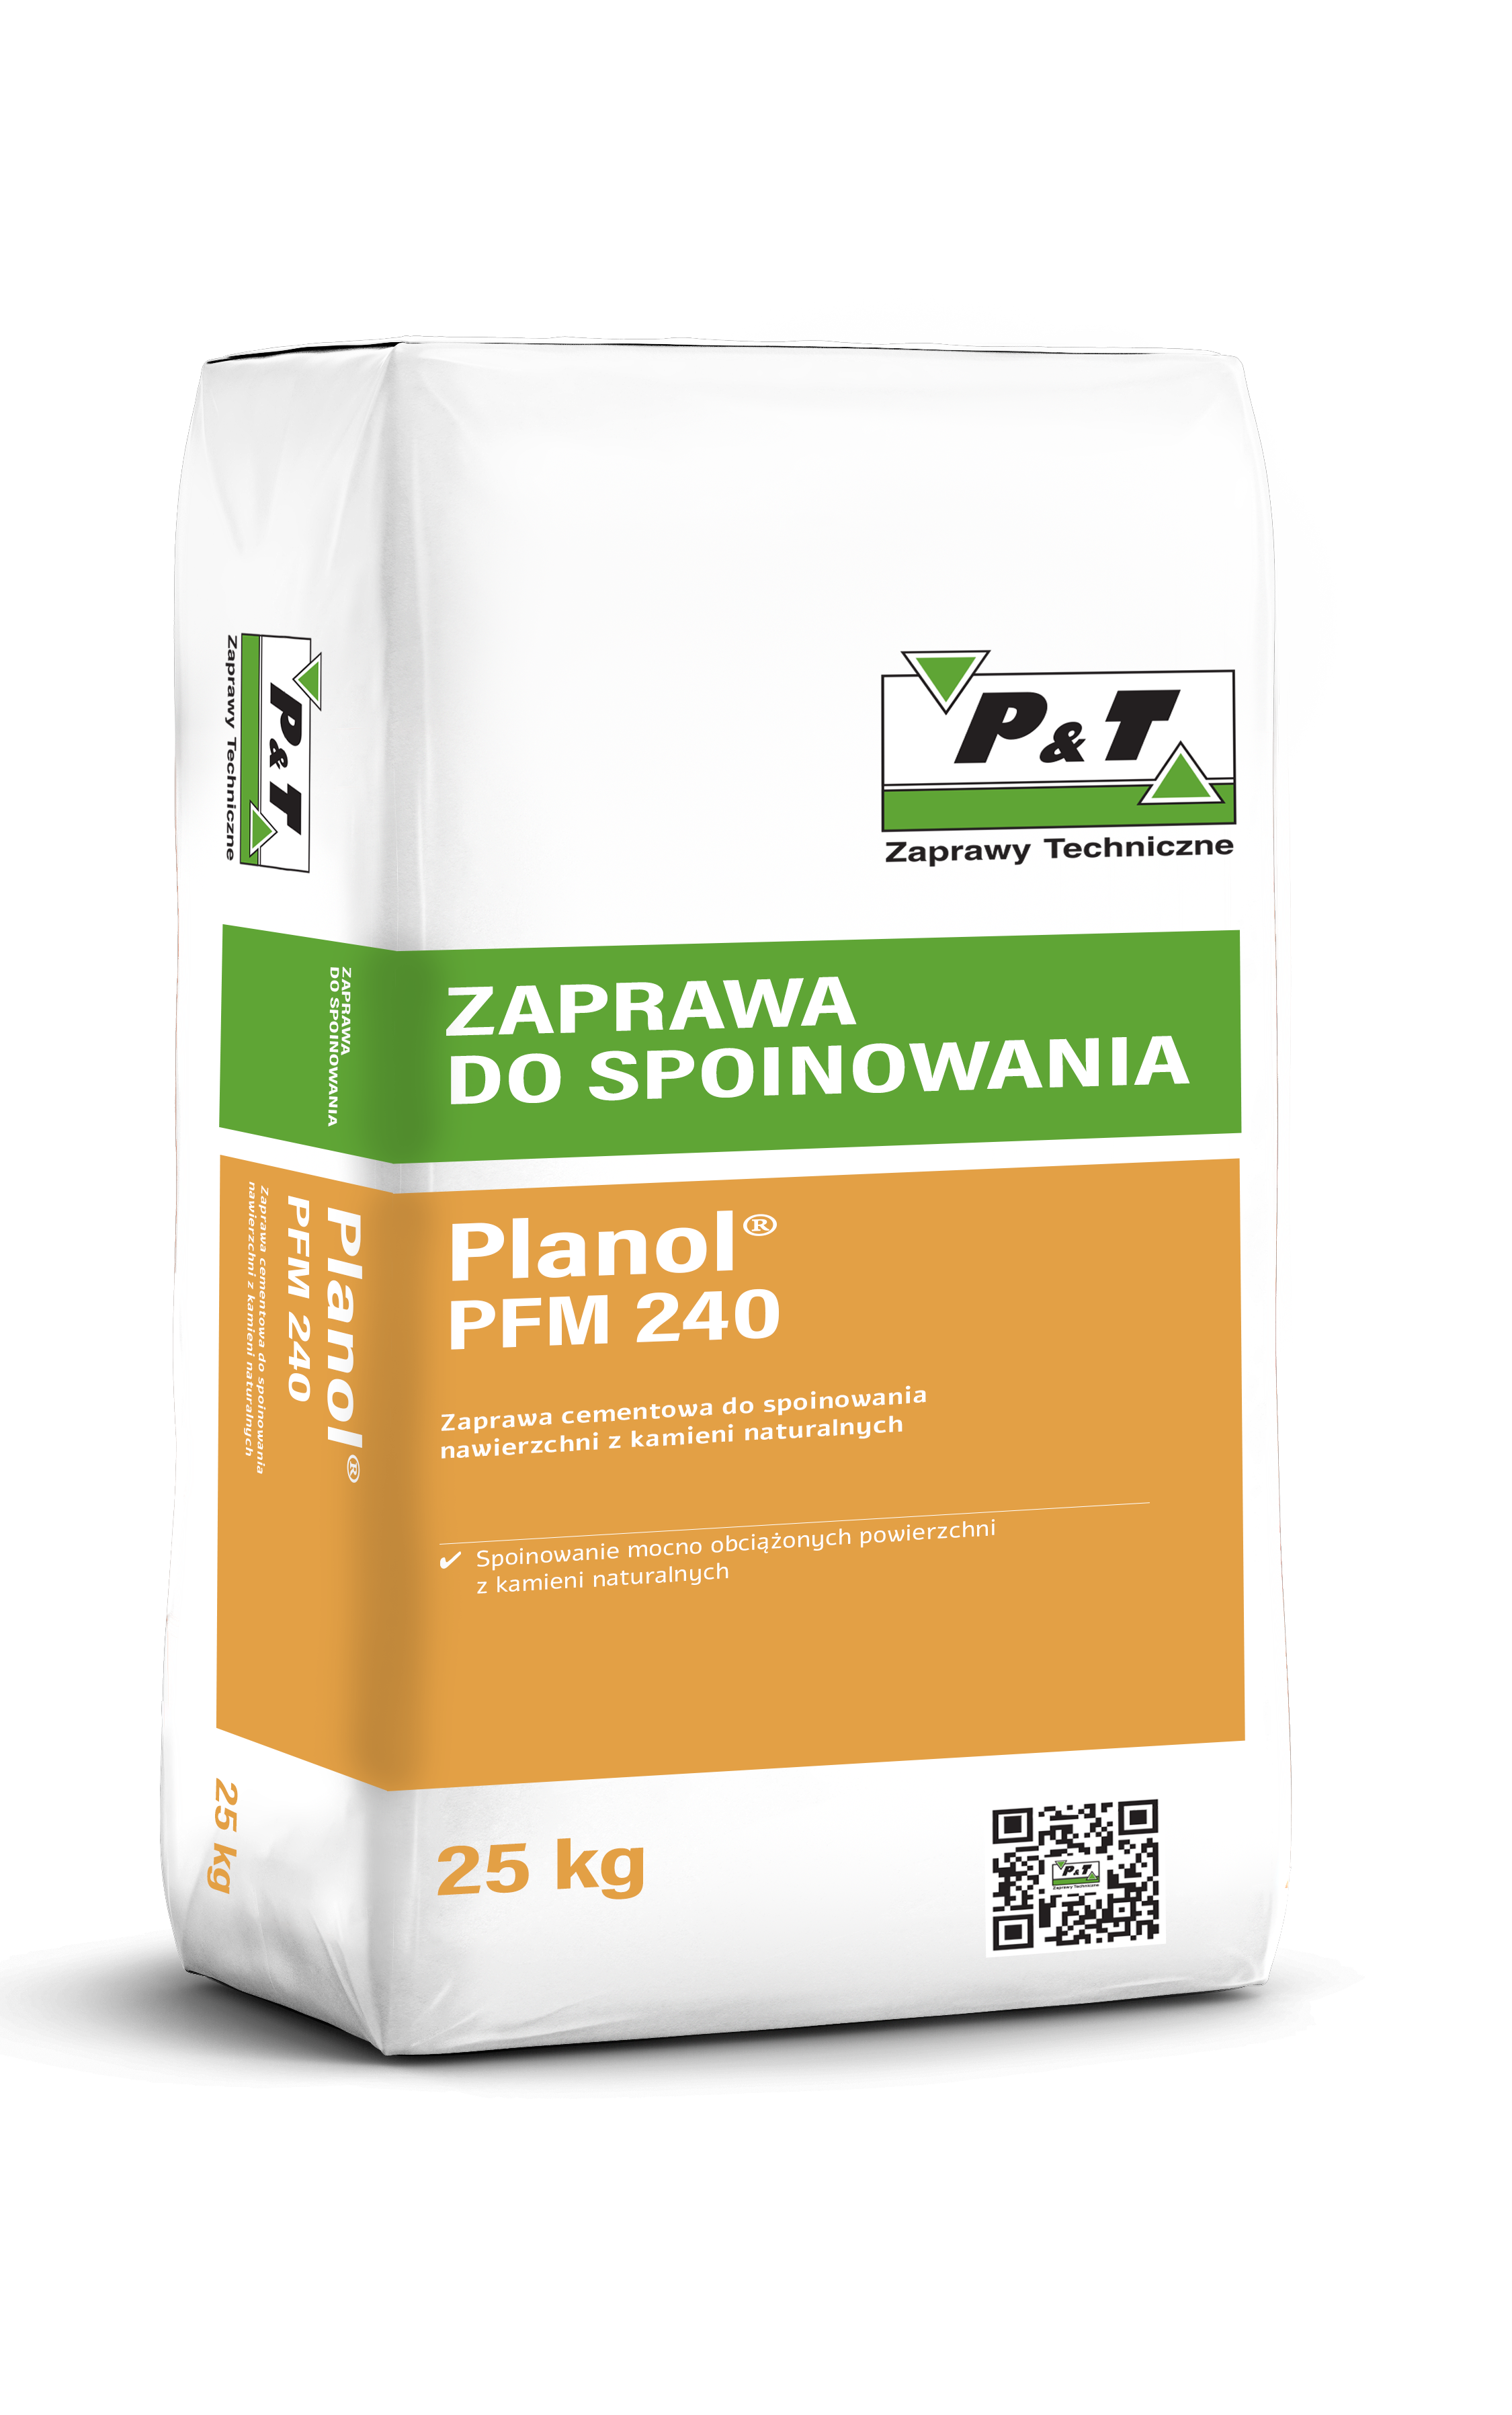 Planol PFM 240